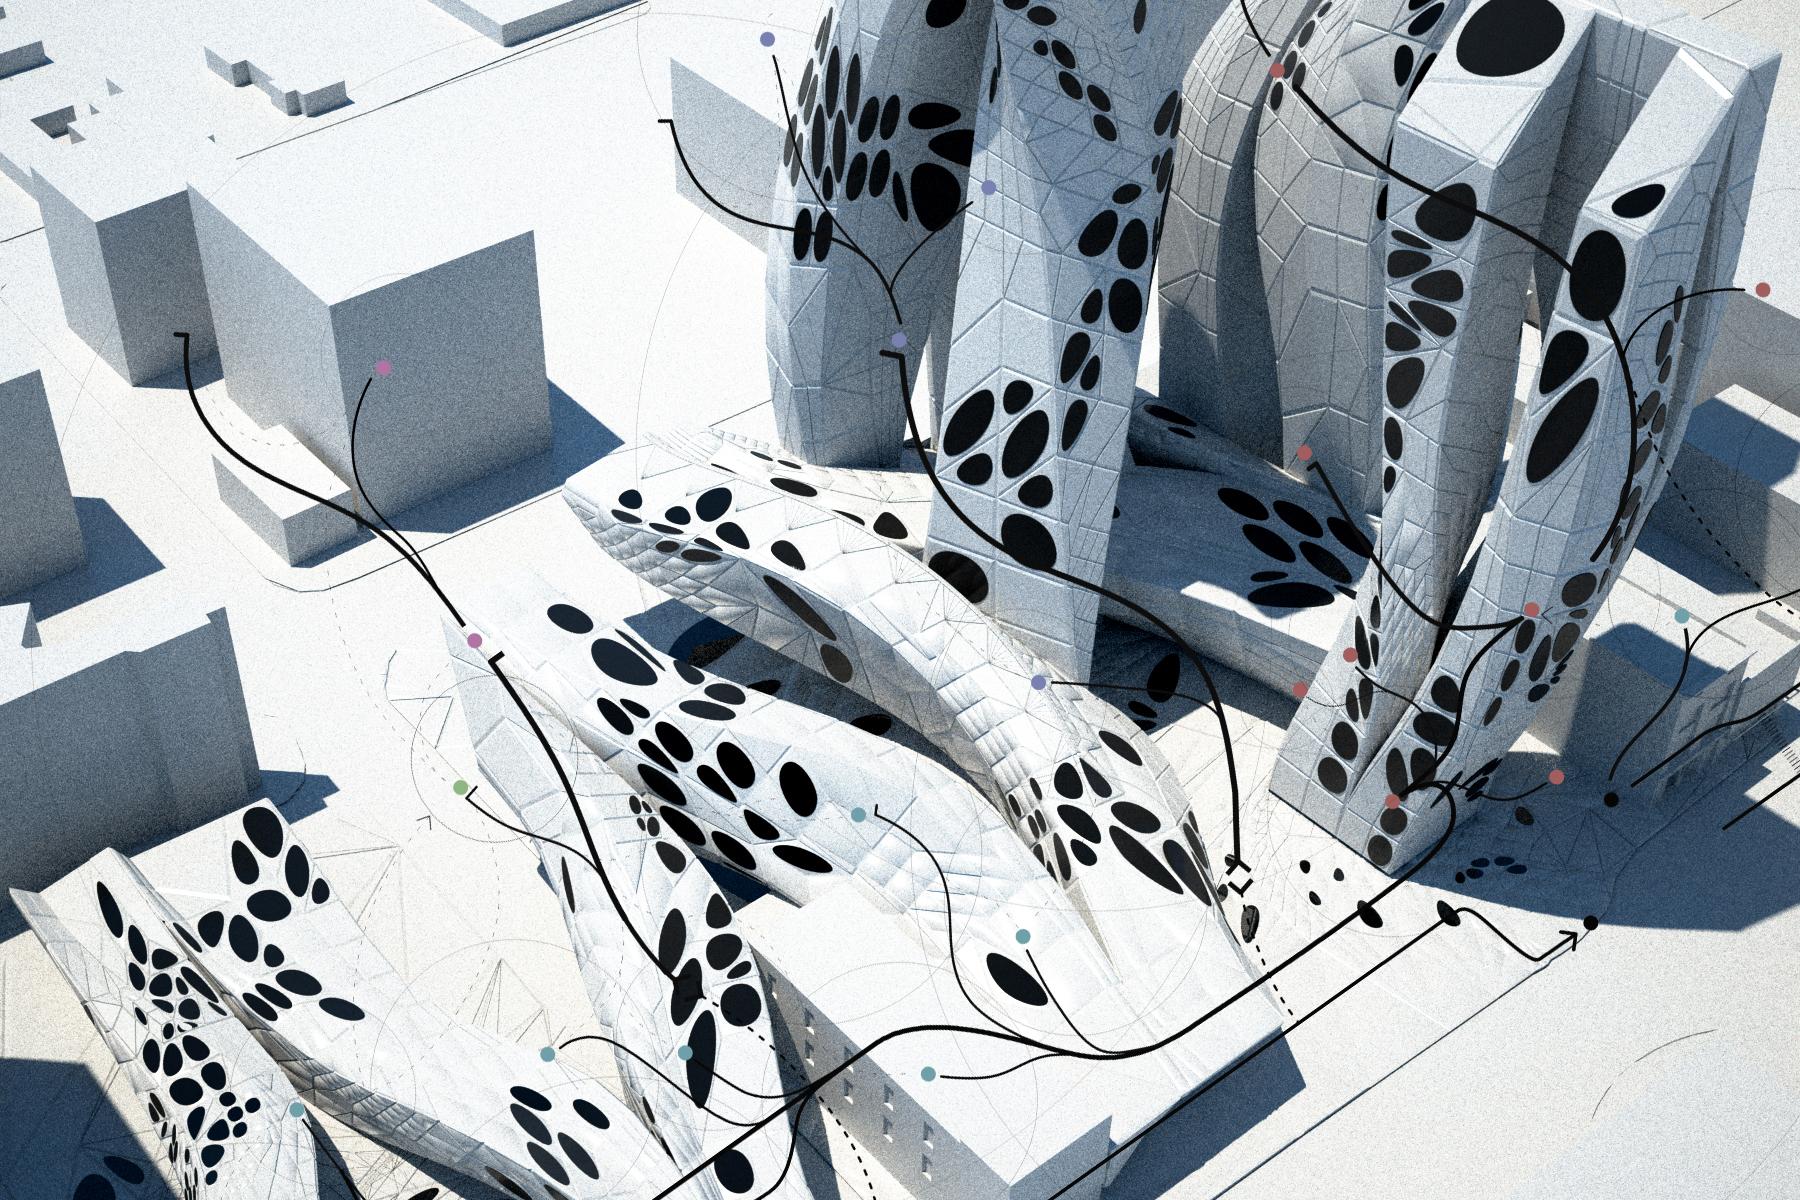 Paul Preissner, CentrePointe, 2008. Rendering. Courtesy of Paul Preissner Architects.